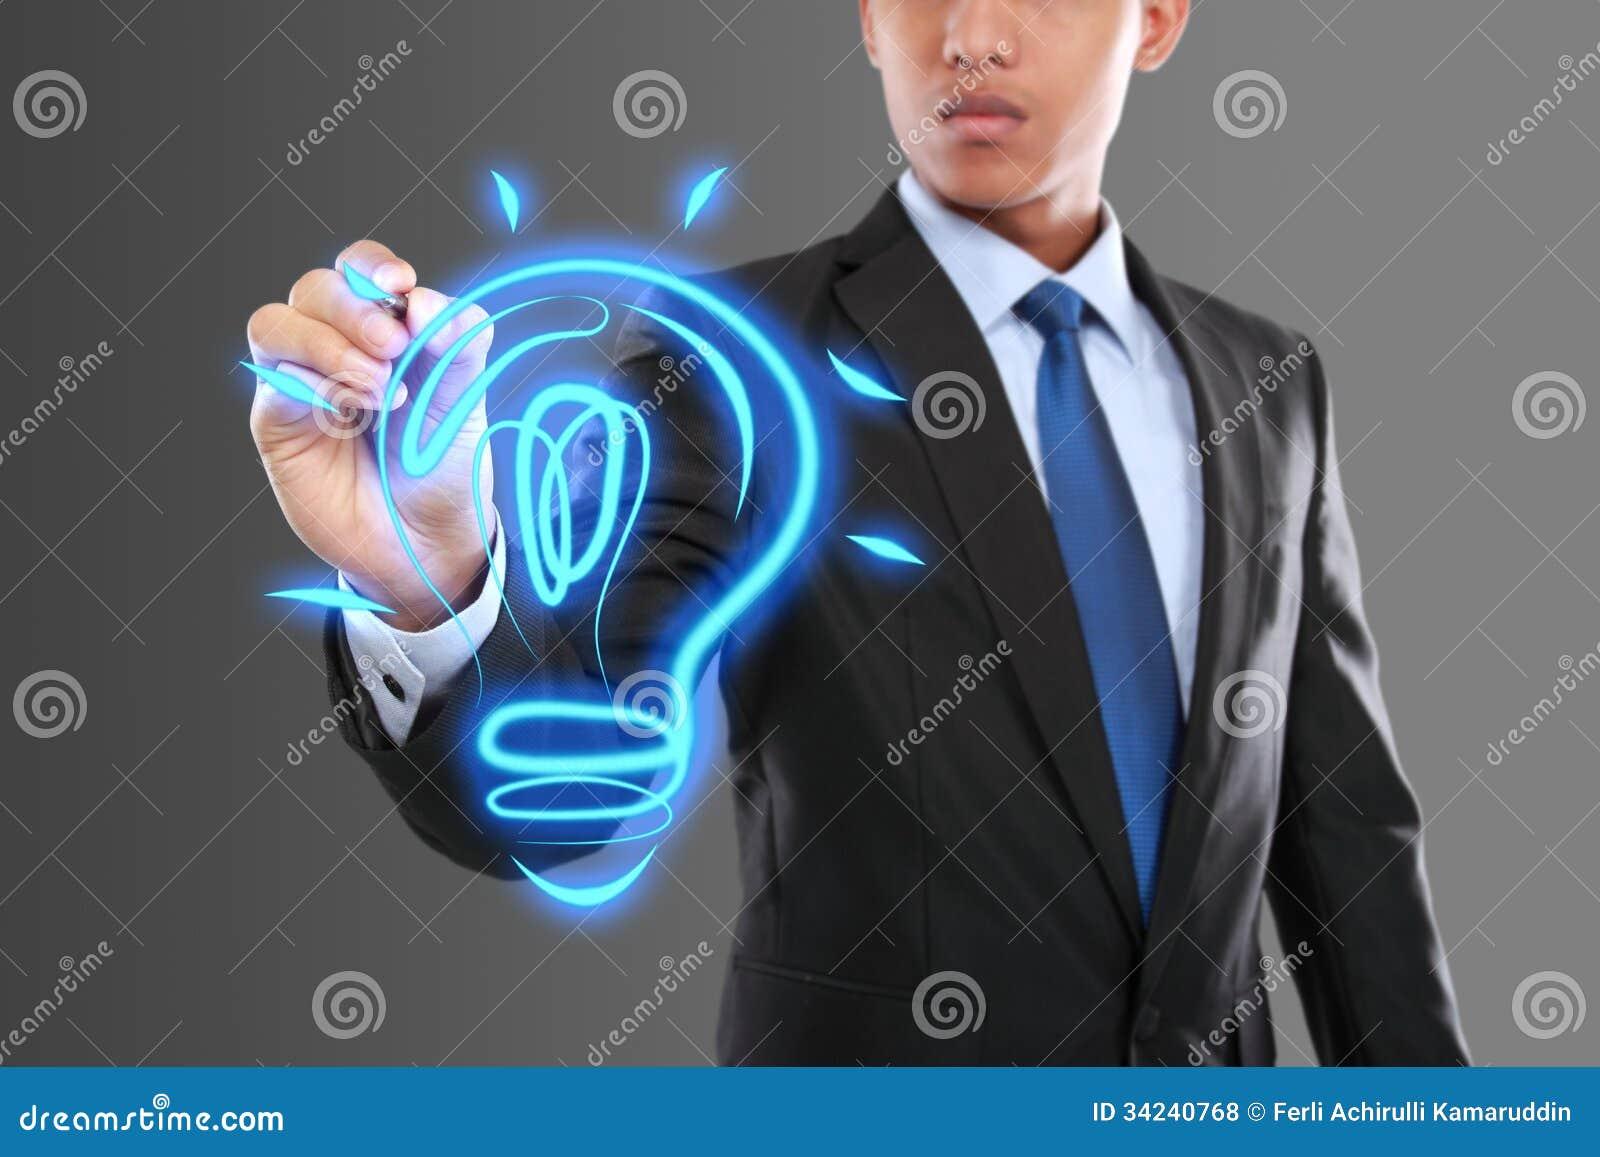 Электрическая лампочка идеи чертежа бизнесмена